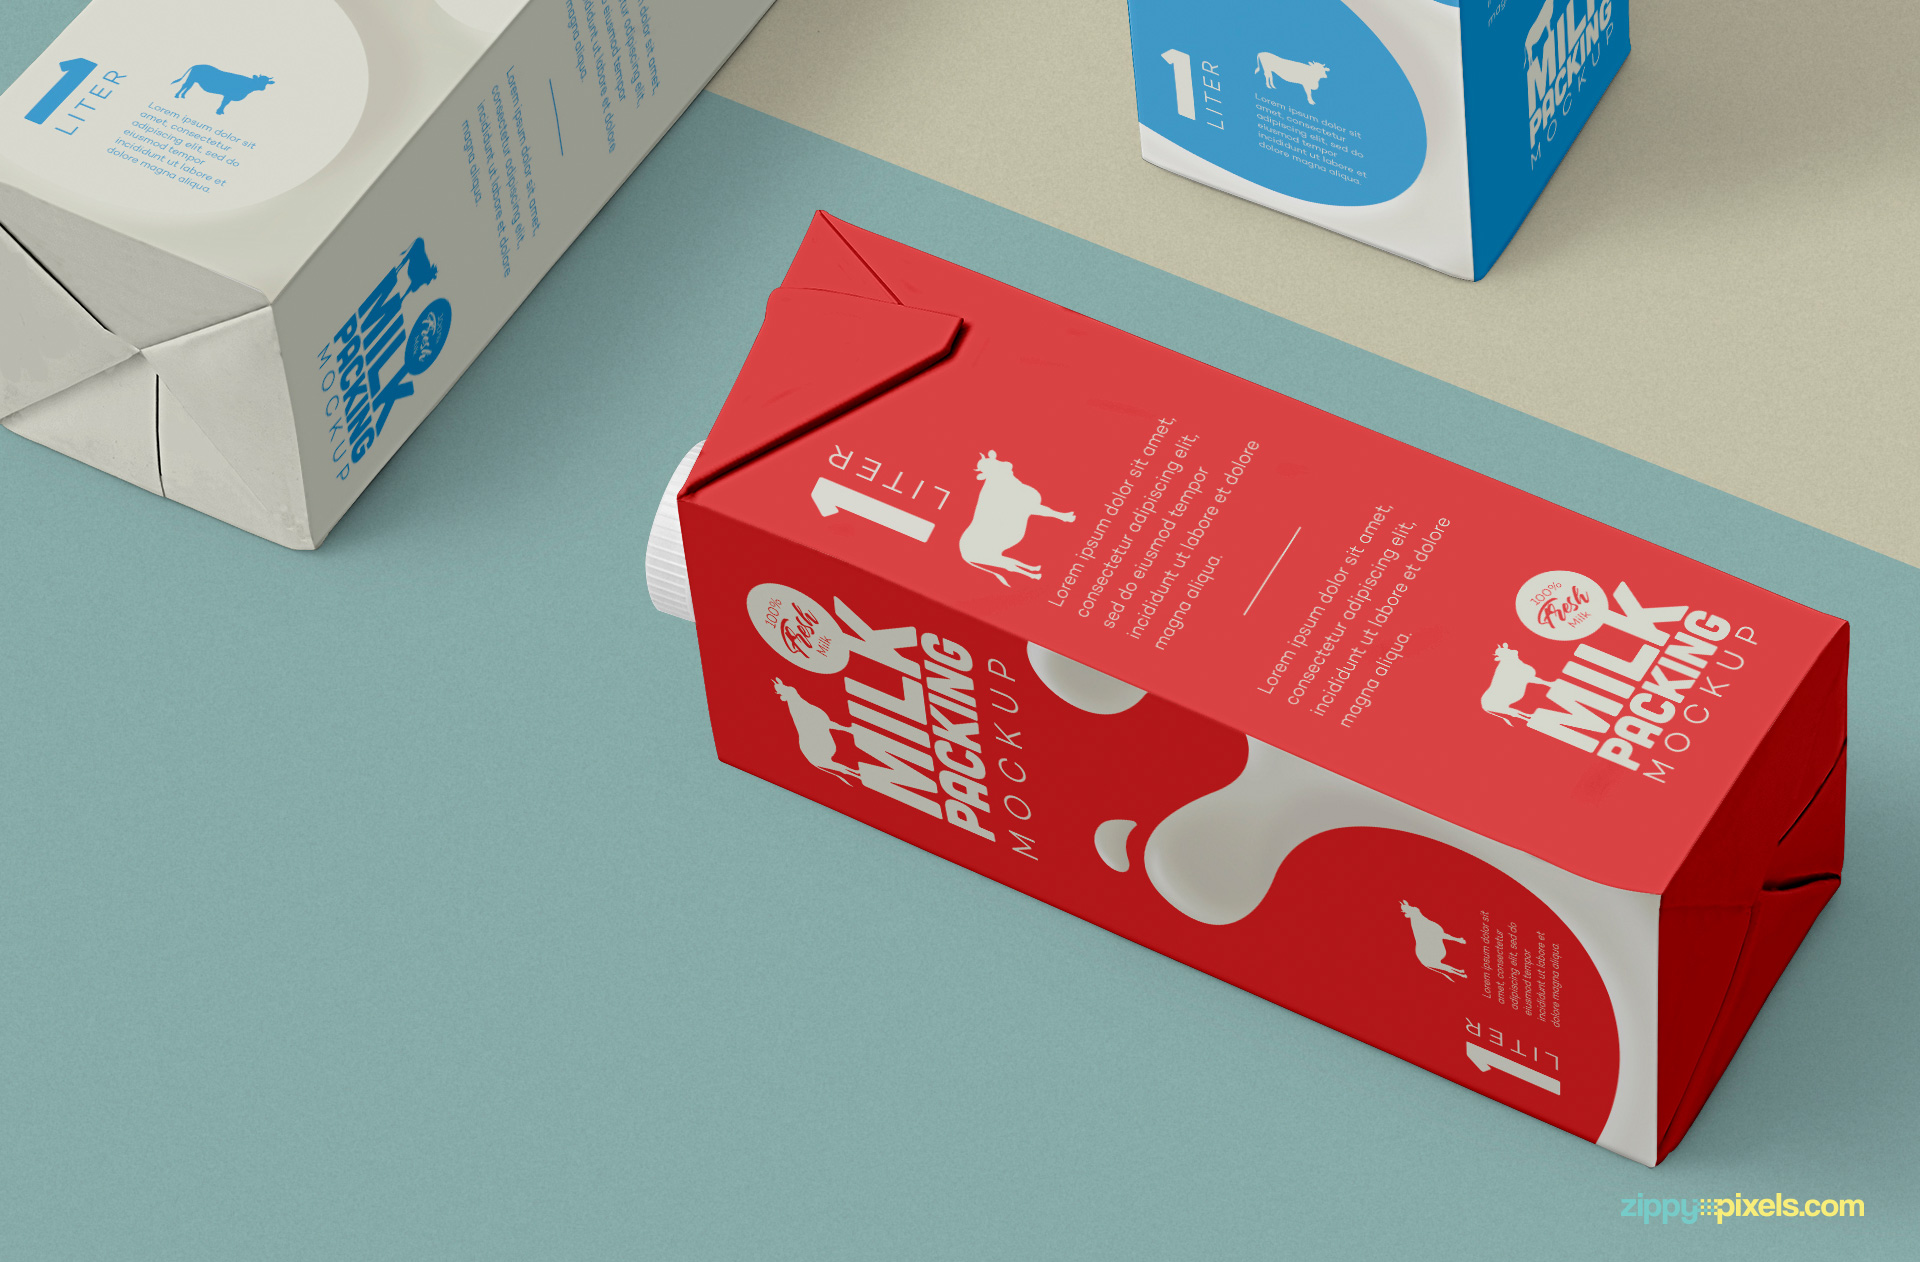 Milk carton lying on floor.